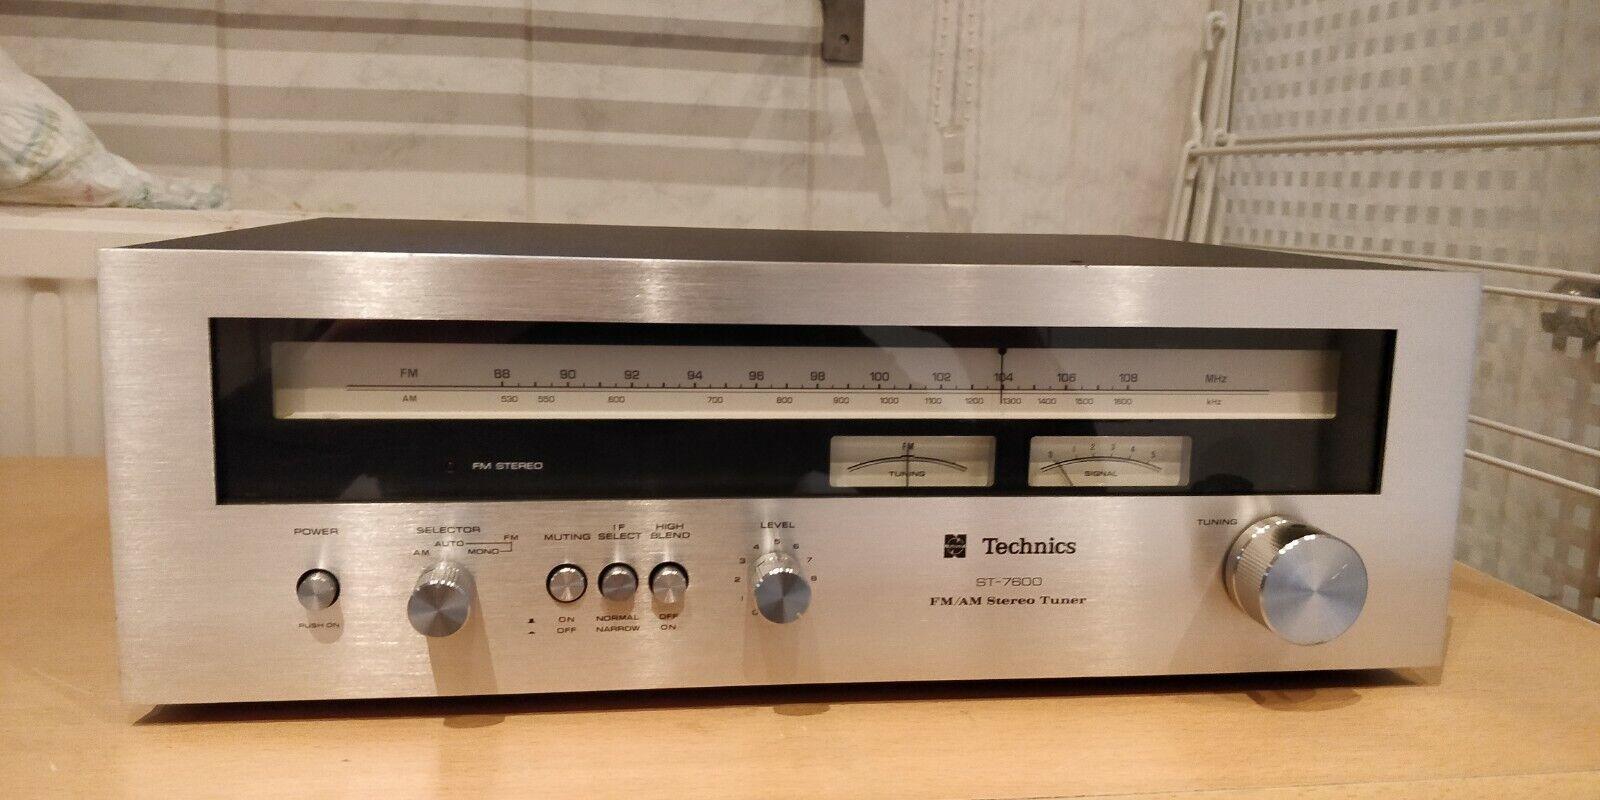 Technics ST-7600 AM/FM Stereo Tuner (1976-77)